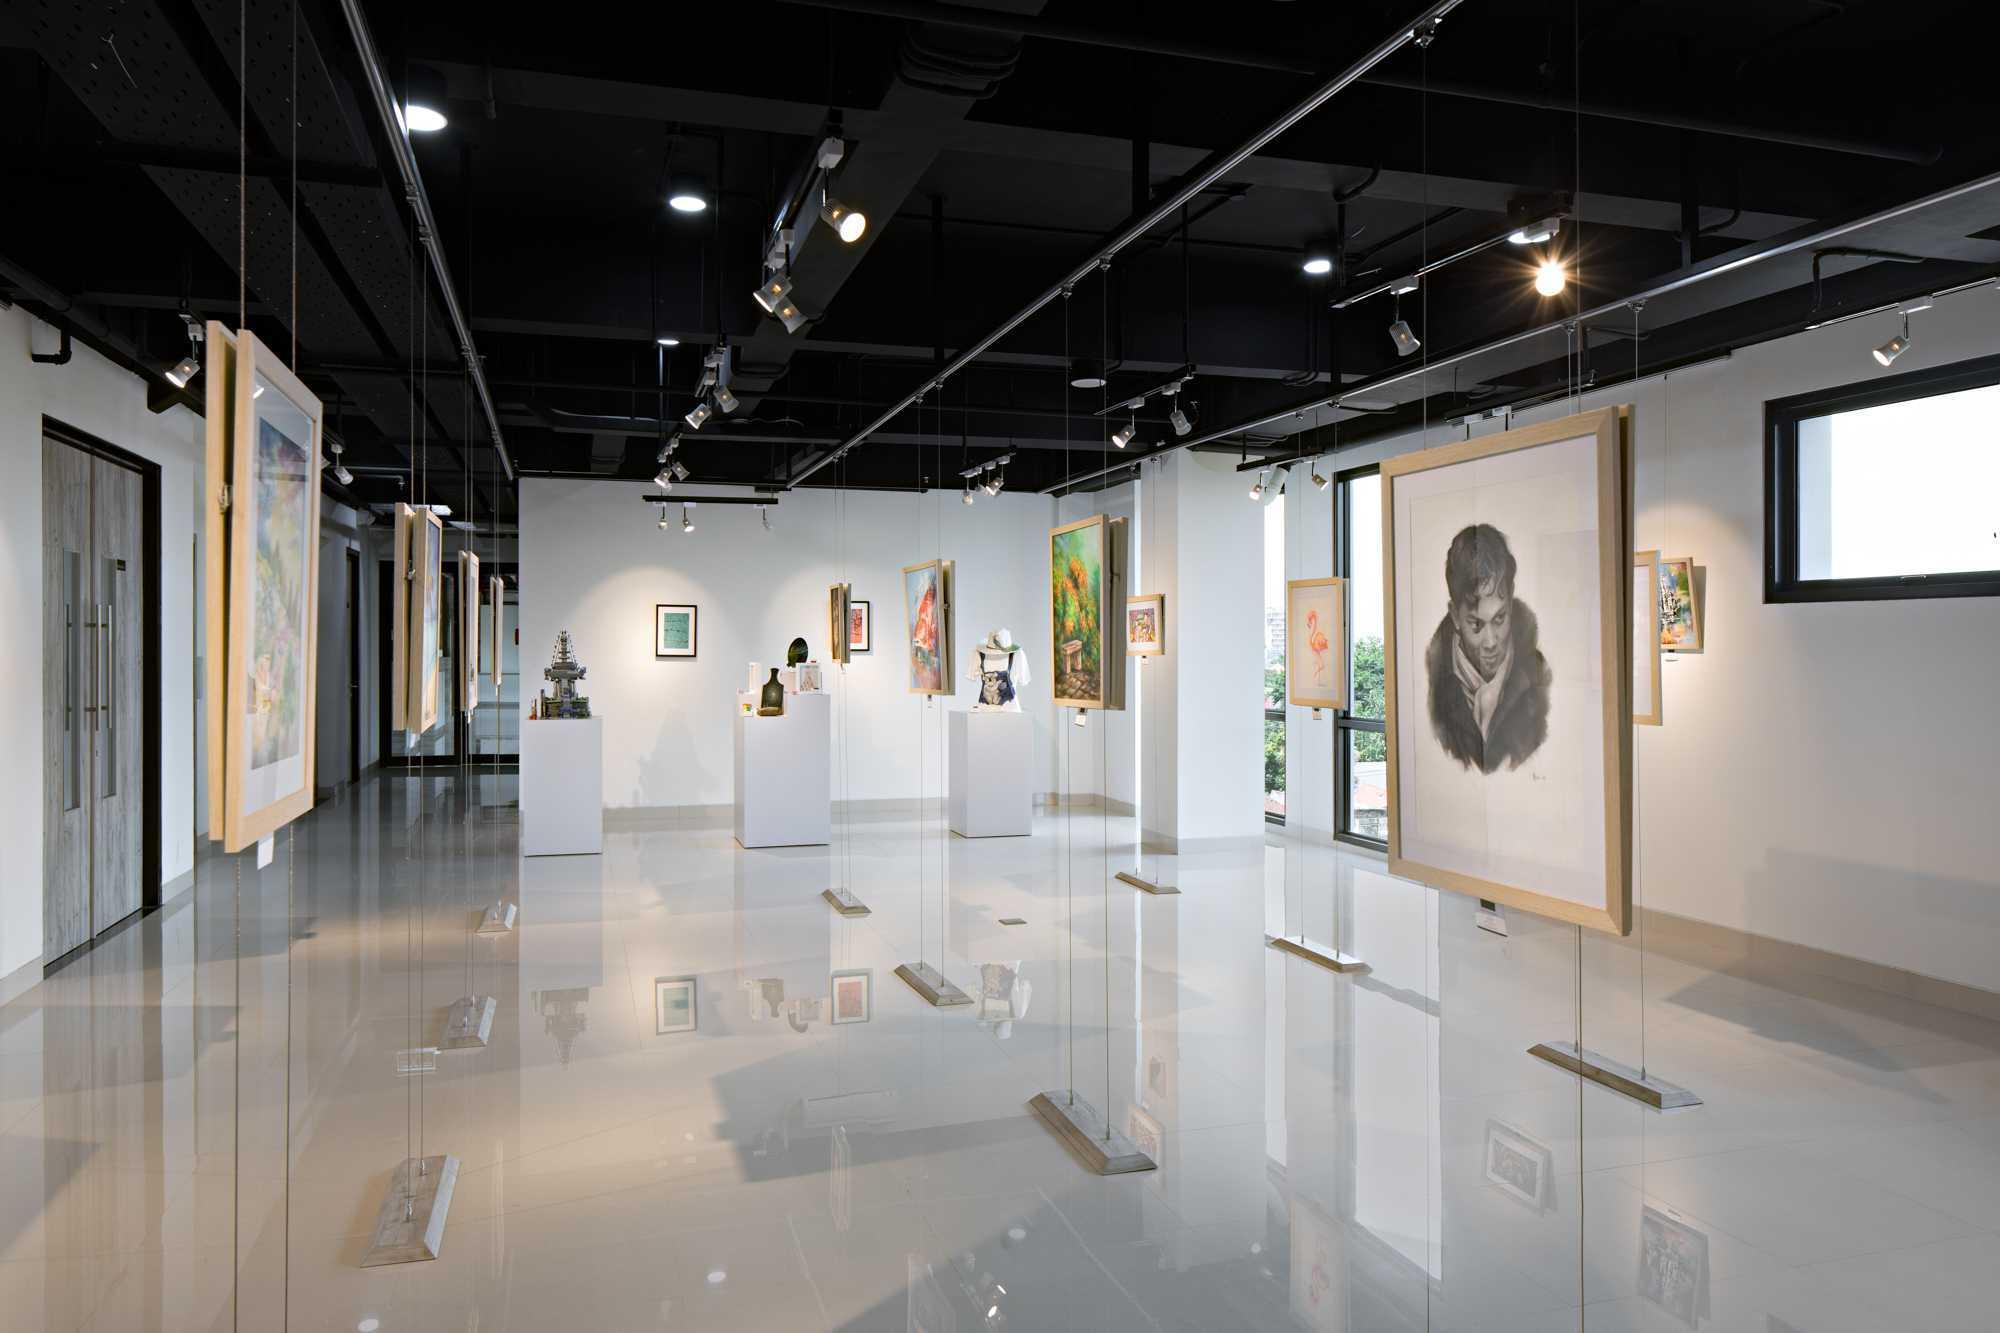 Best Group Design Studio Faber Castell International - Surabaya Surabaya, Kota Sby, Jawa Timur, Indonesia Surabaya, Kota Sby, Jawa Timur, Indonesia Best-Group-Design-Studio-Faber-Castell-International-Surabaya  88492